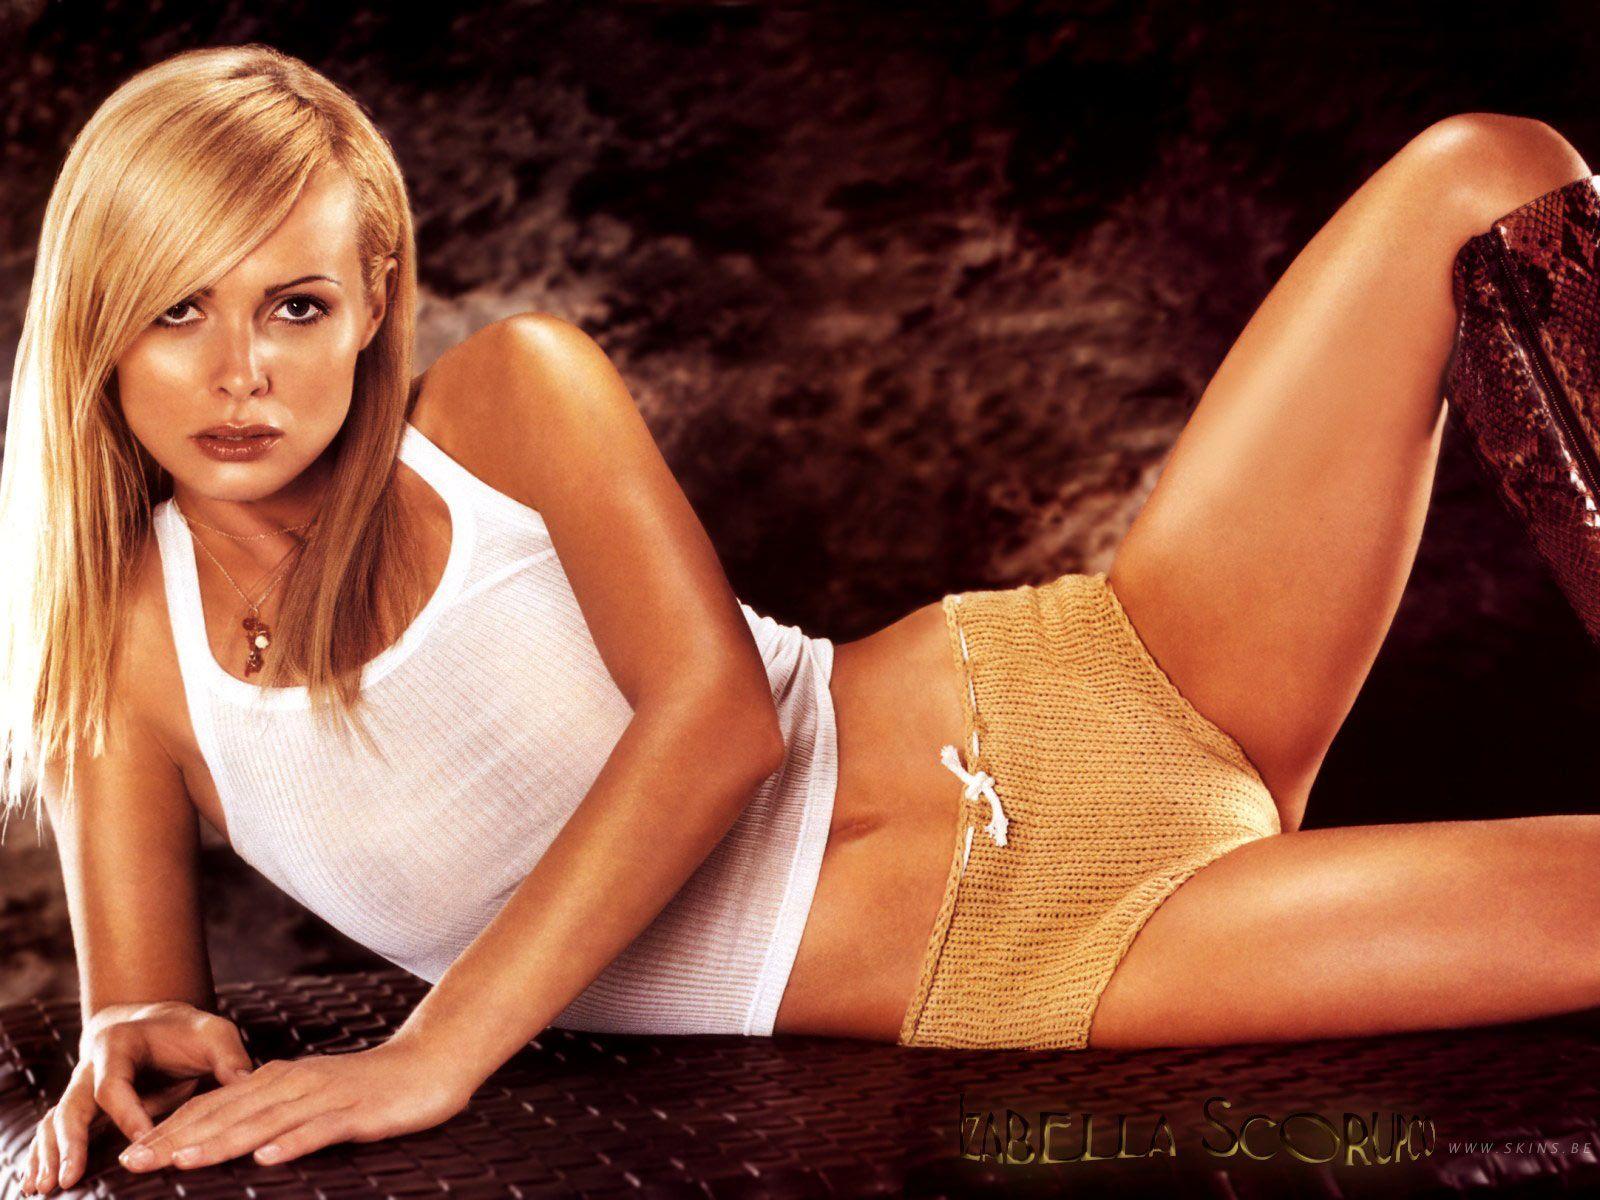 Bond Girl Izabella Scorupco   Celebrity pictures, Bond